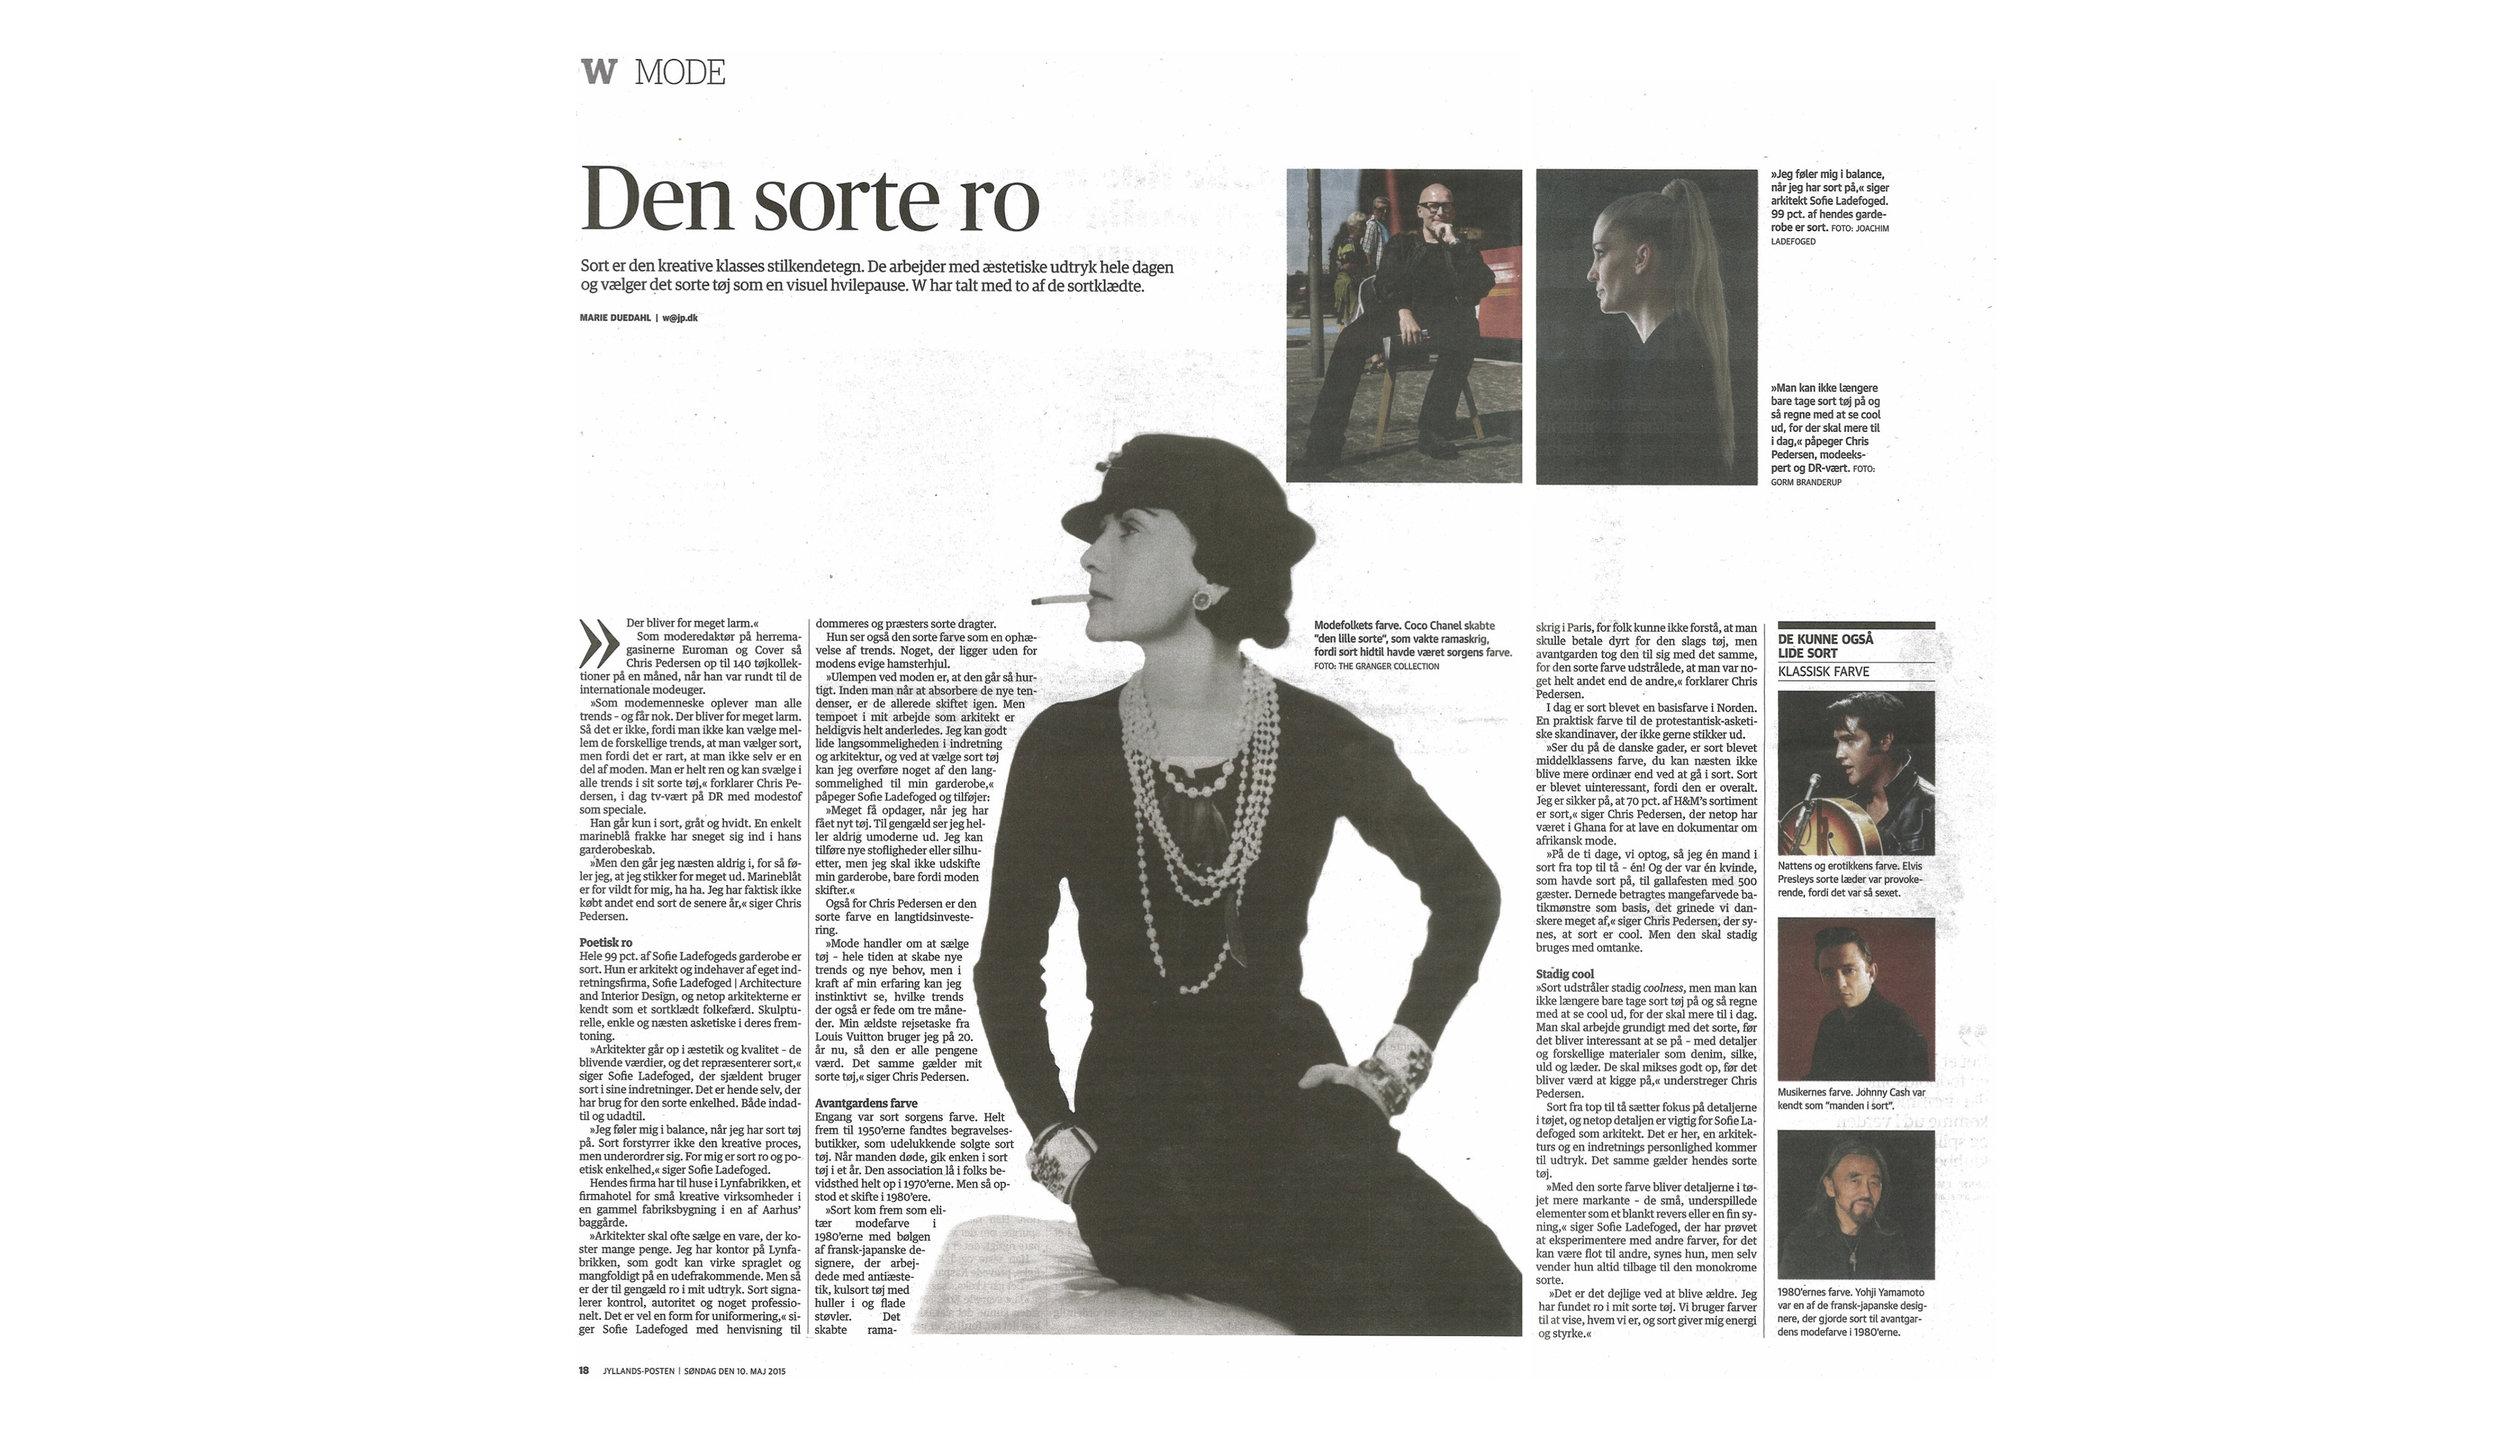 sofie-ladefoged-press-jyllands-posten-2015-page-02.jpg